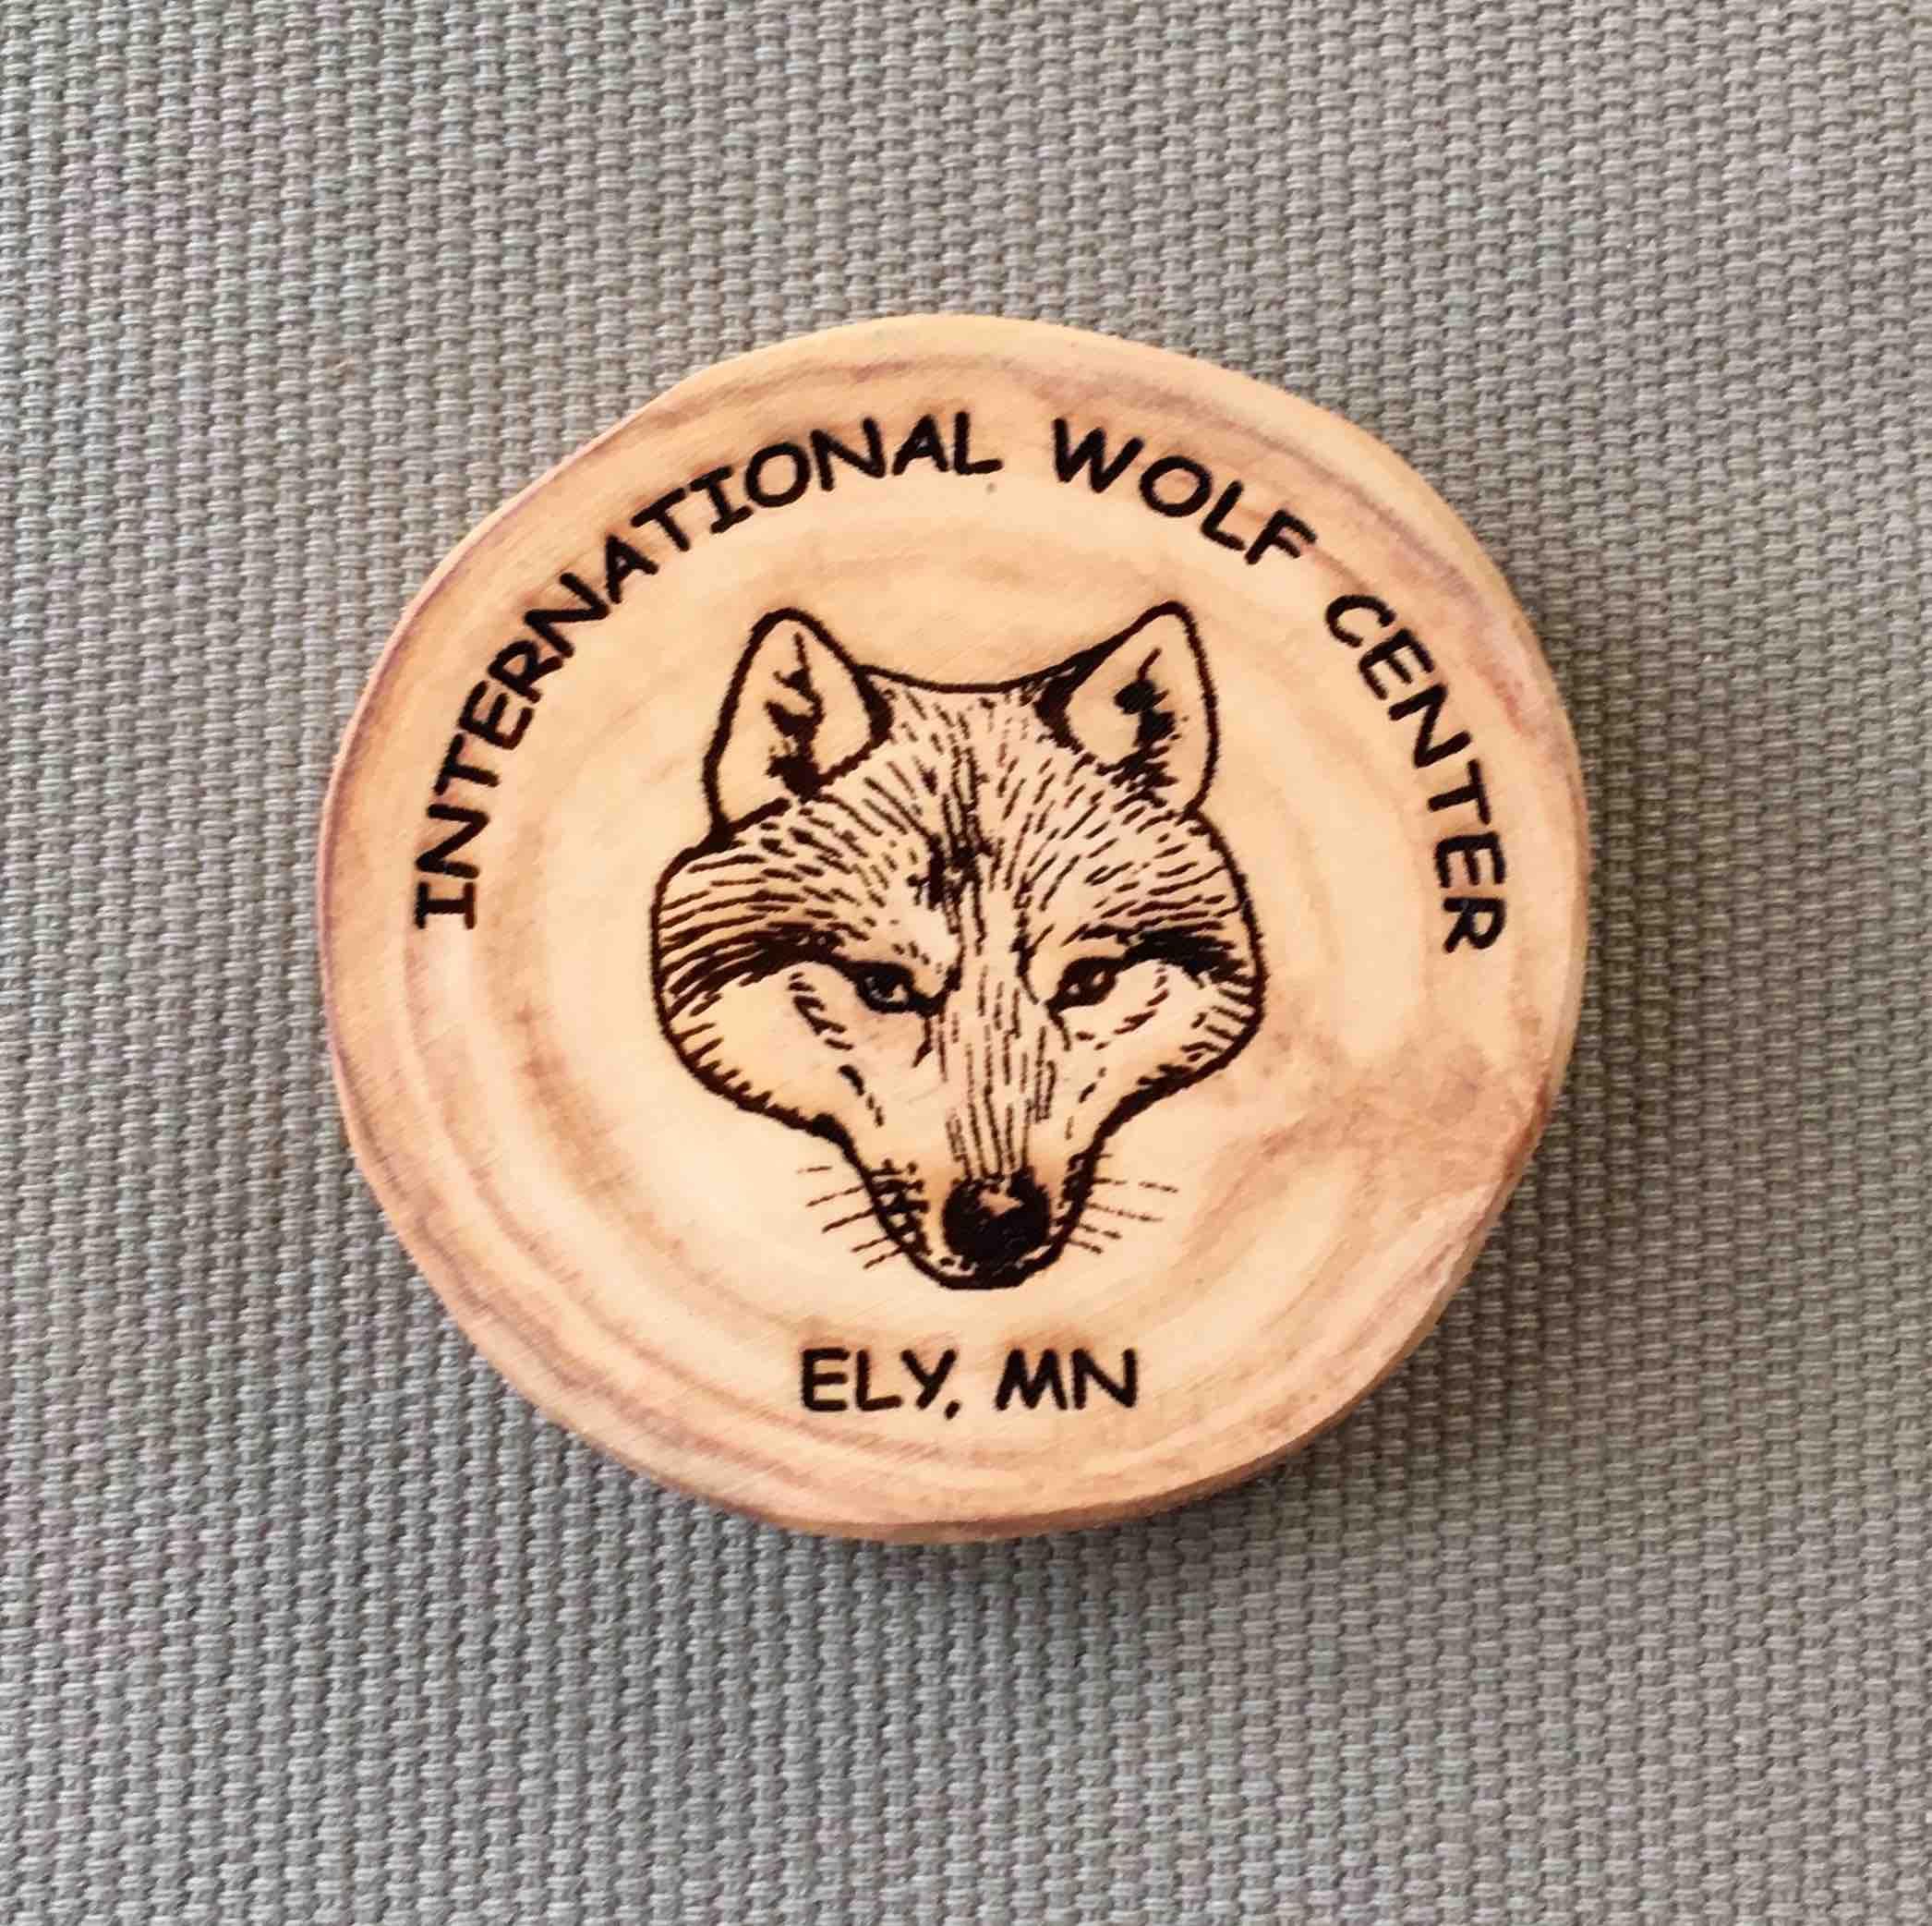 International Wolf Center (Ely, Minnesota)